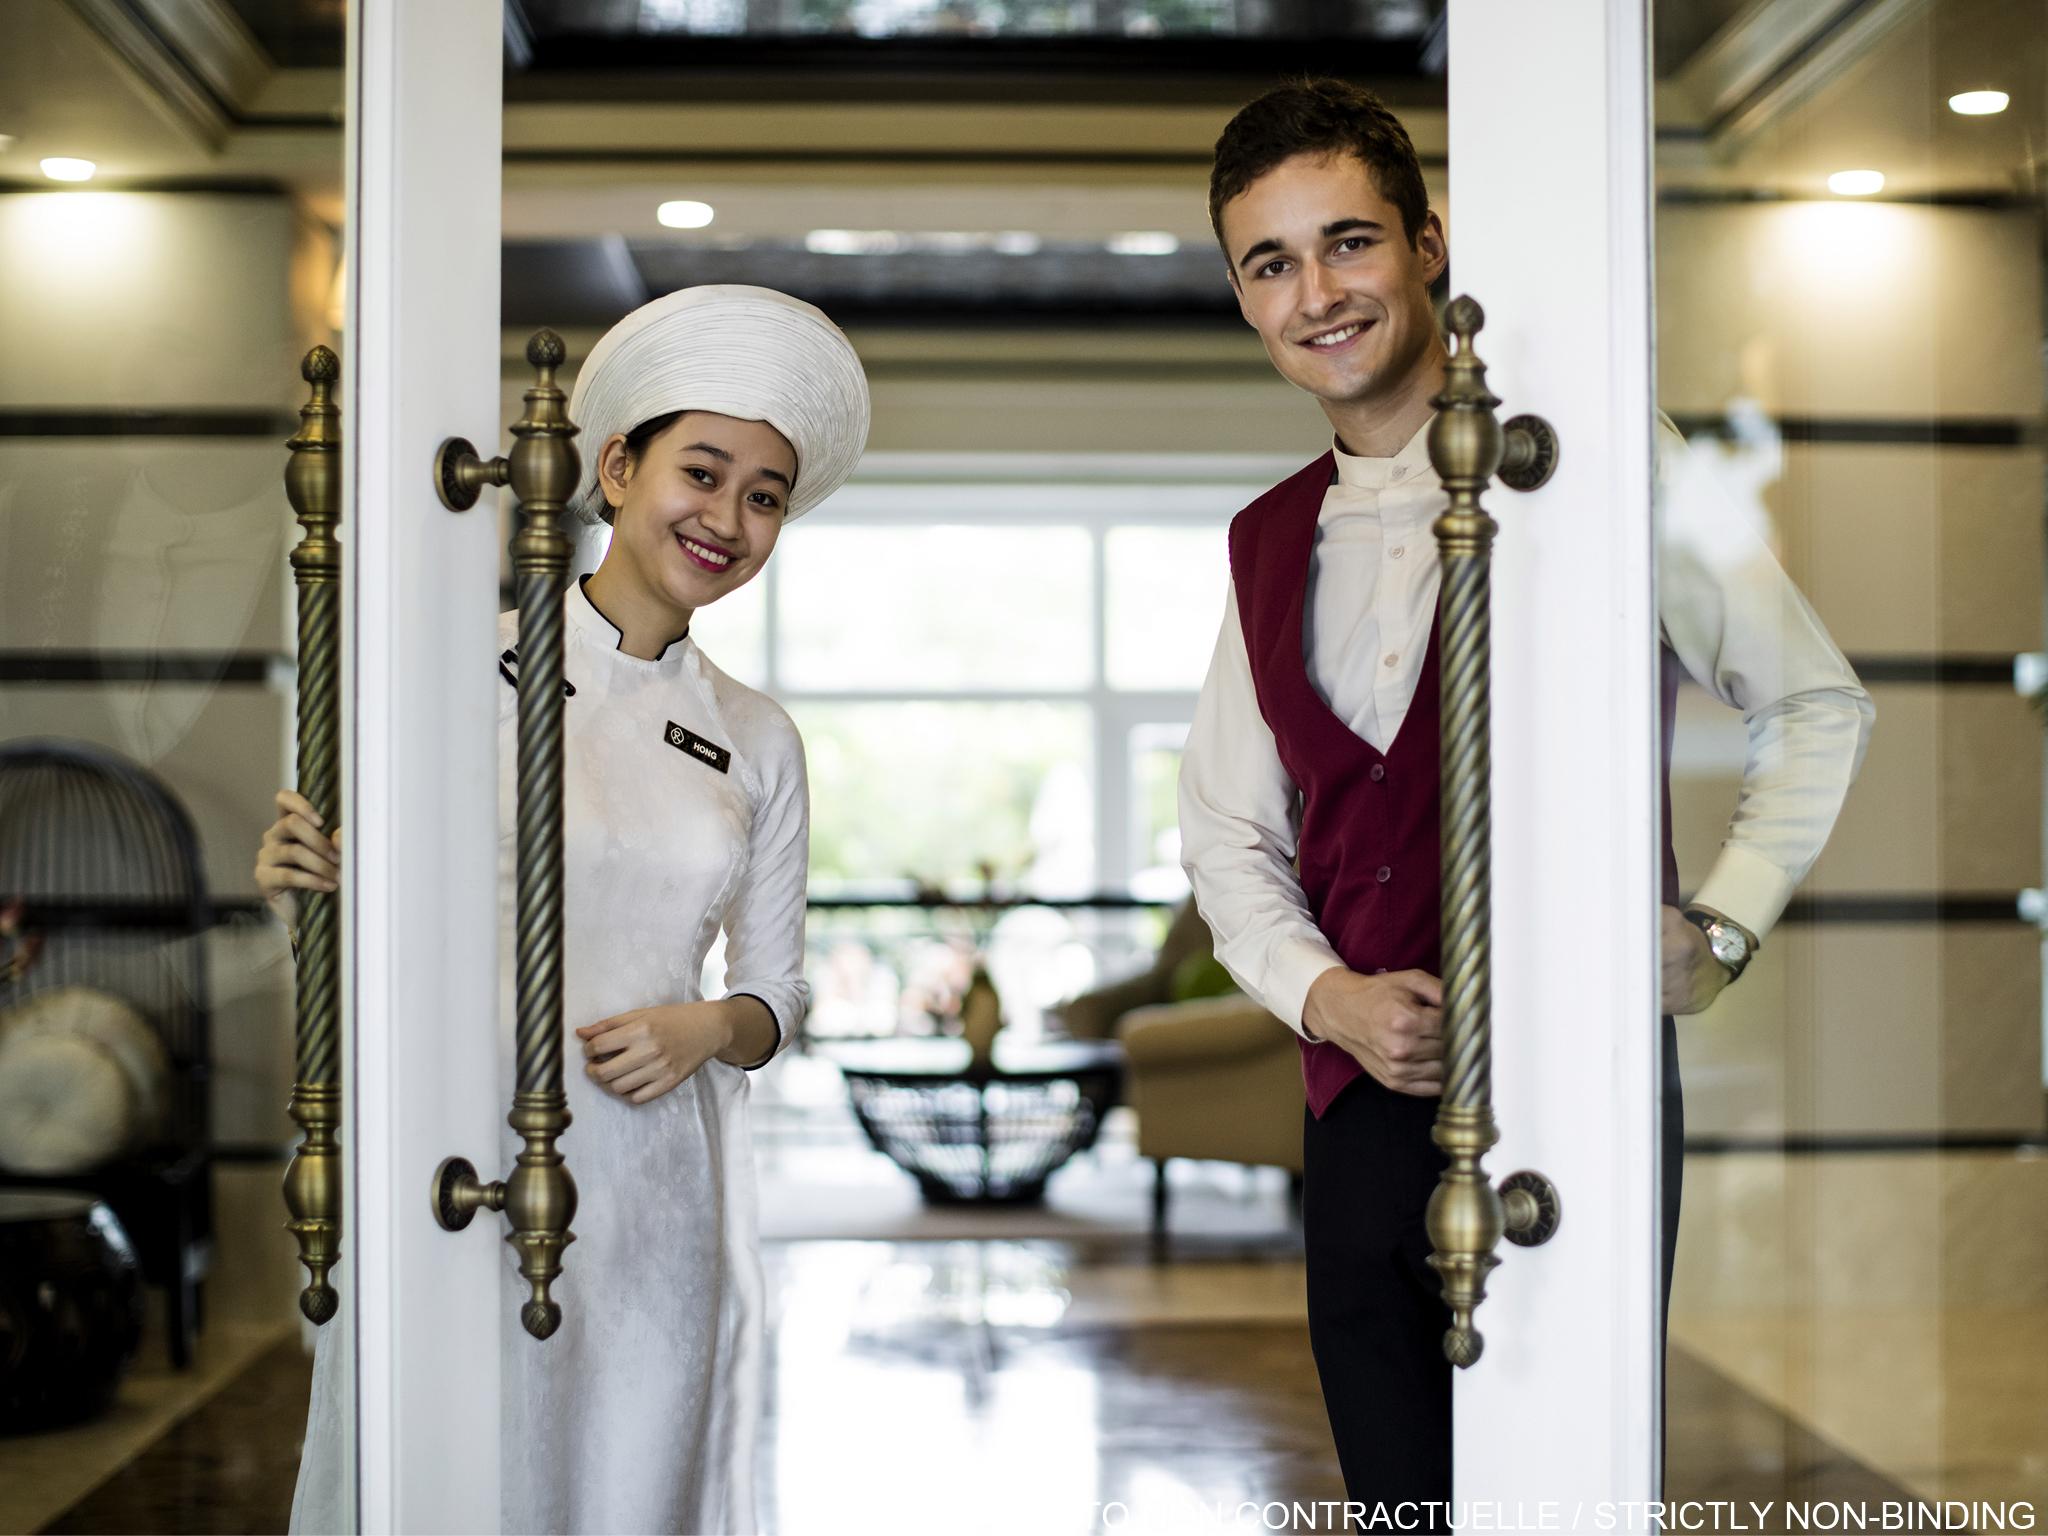 Hotel – Hotel De La Coupole MGallery By Sofitel (abre em setembro 2018)